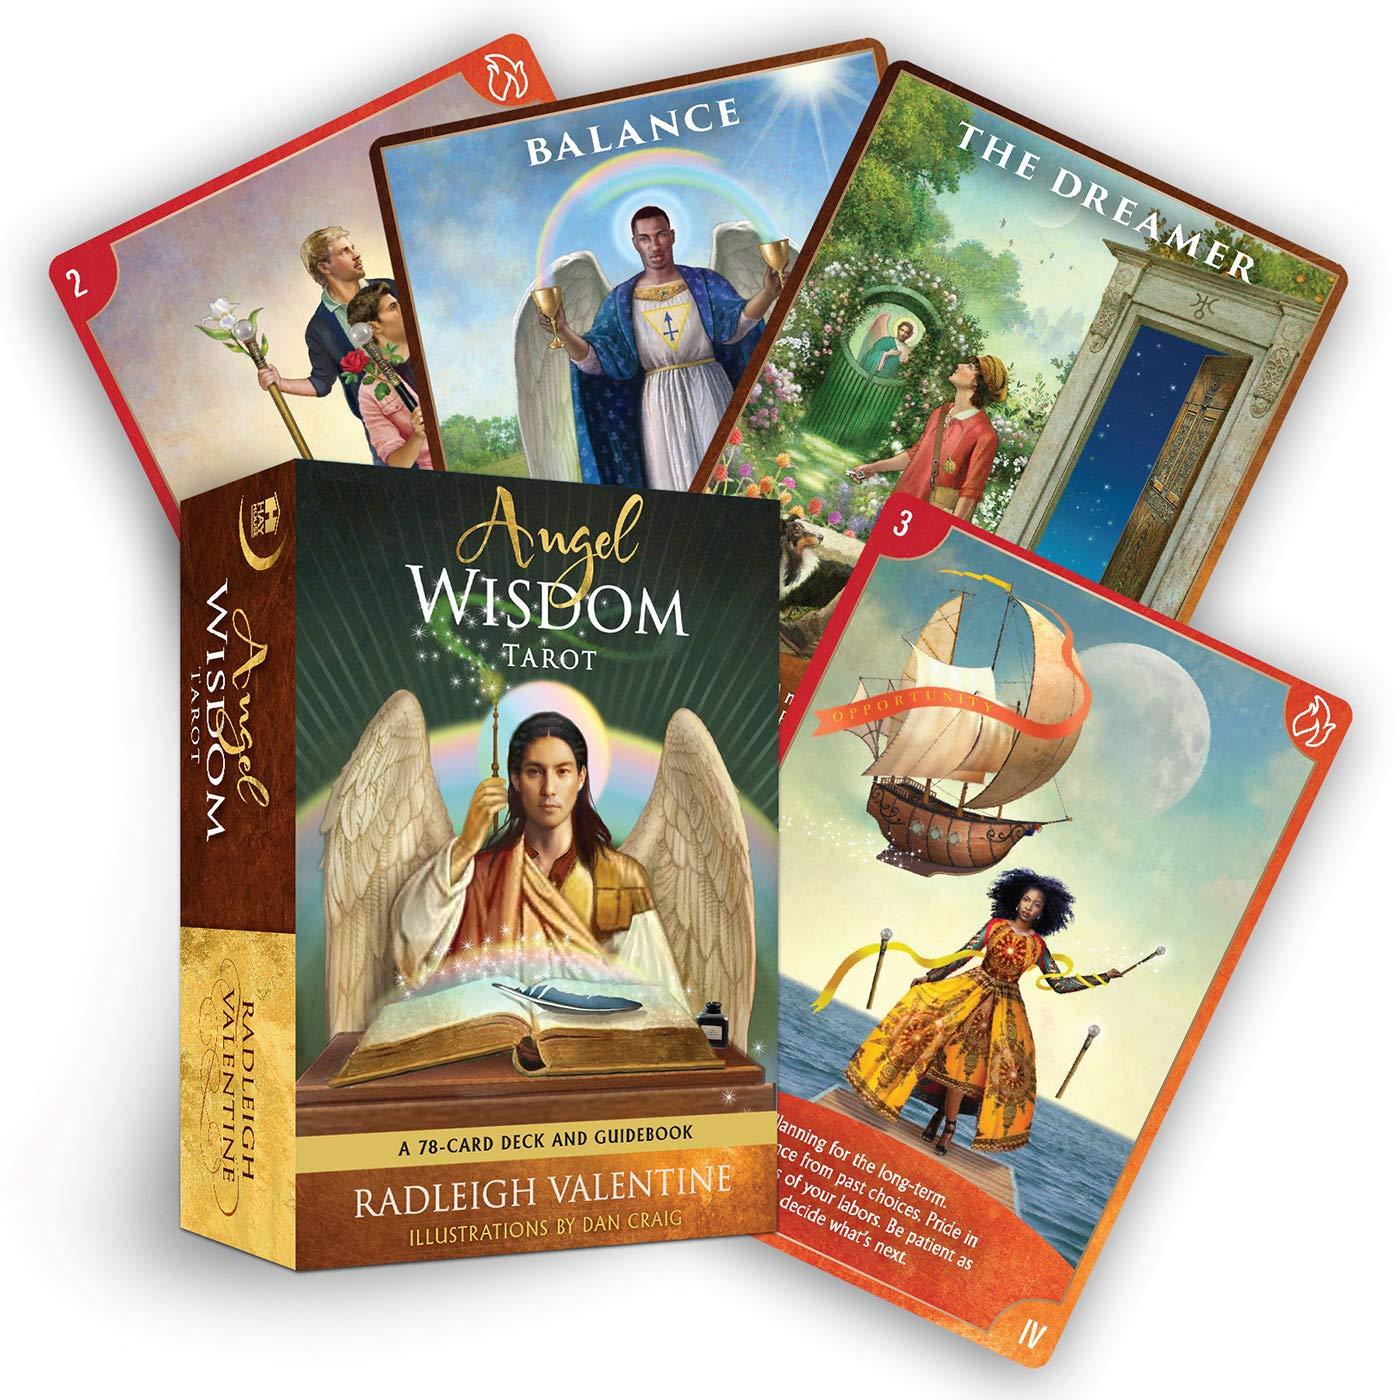 Angel Wisdom Tarot : A 78-Card Deck and Guidebook